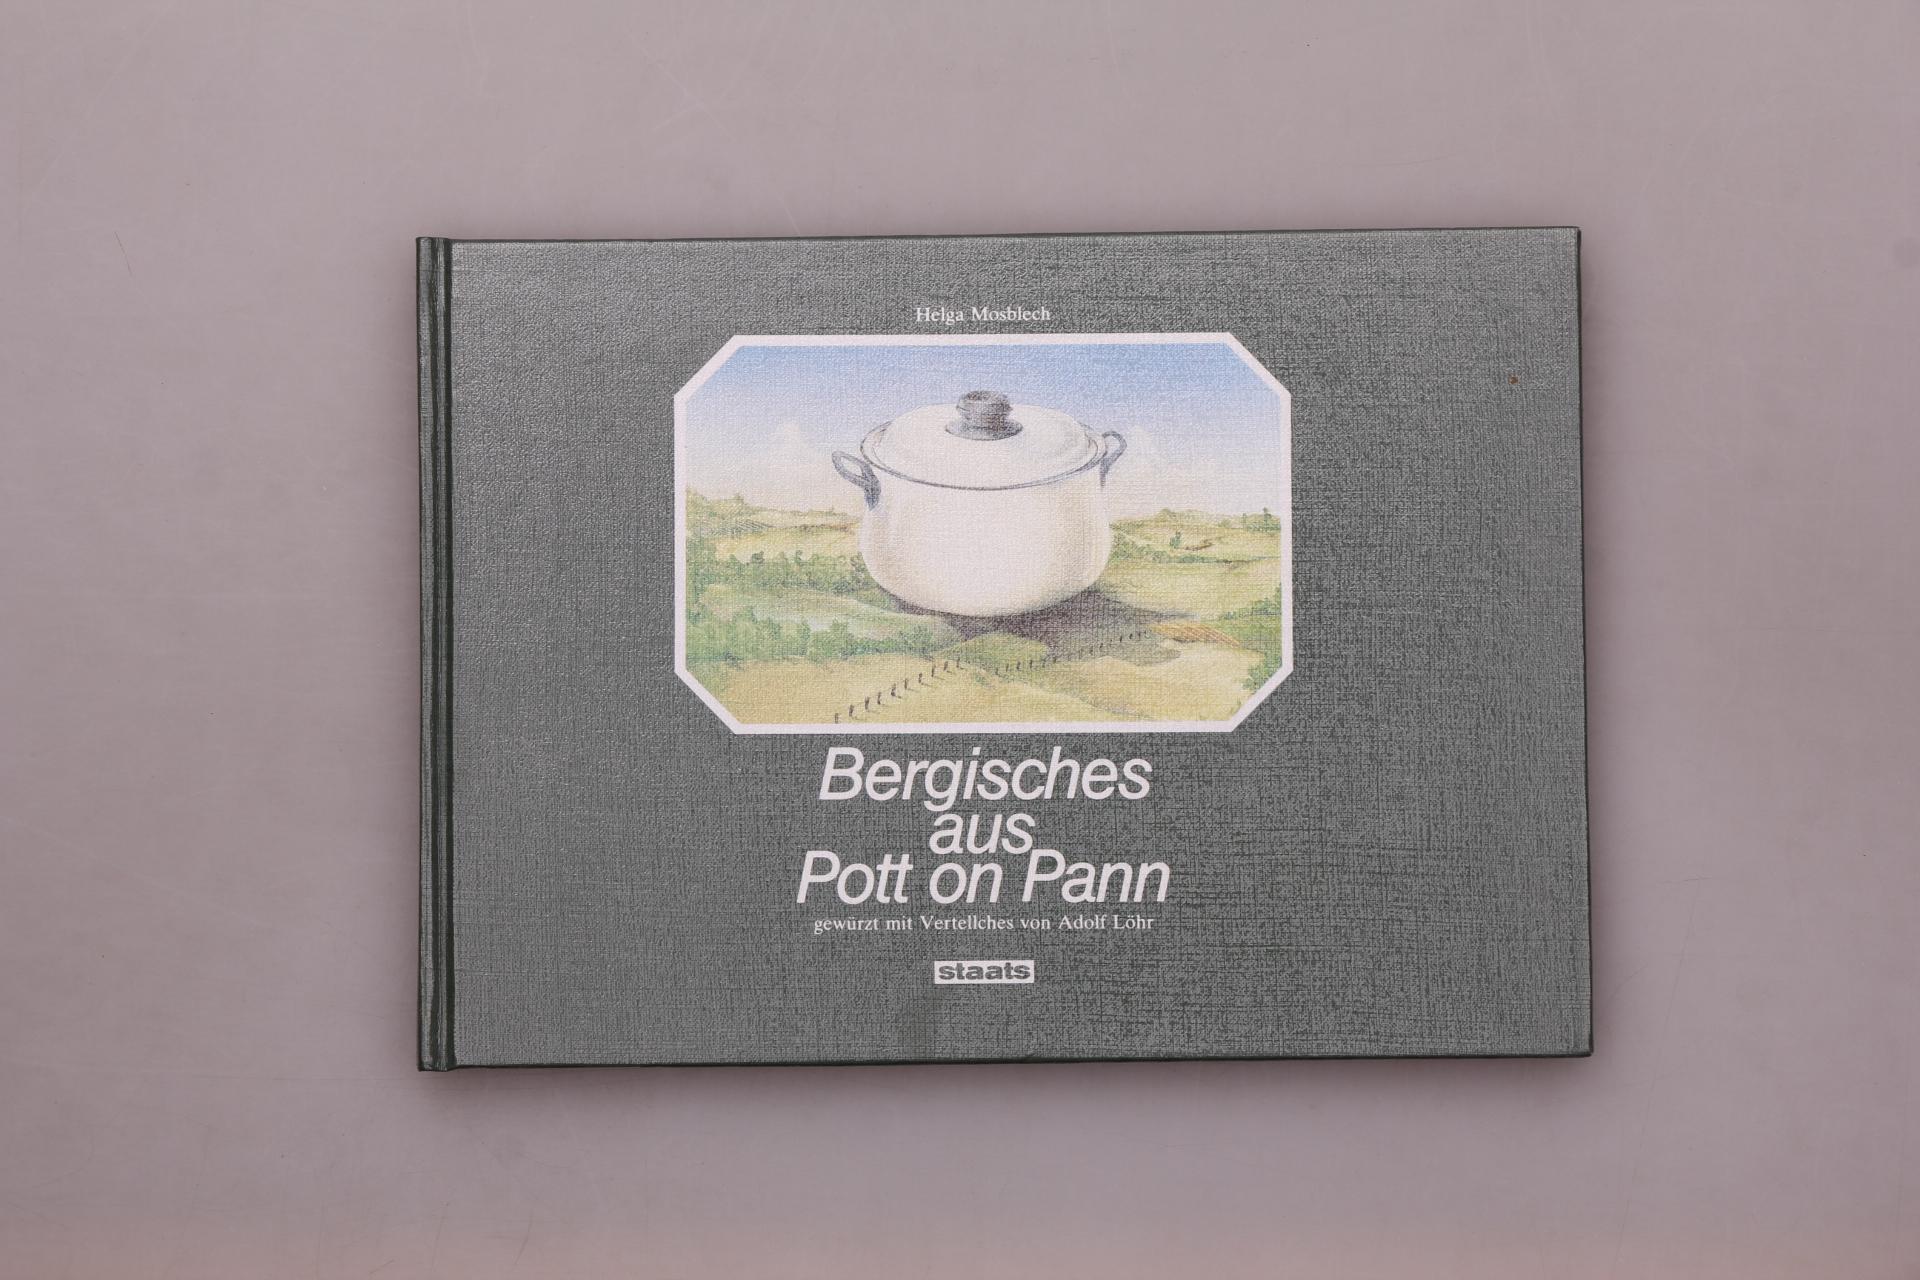 BERGISCHES AUS POTT ON PANN